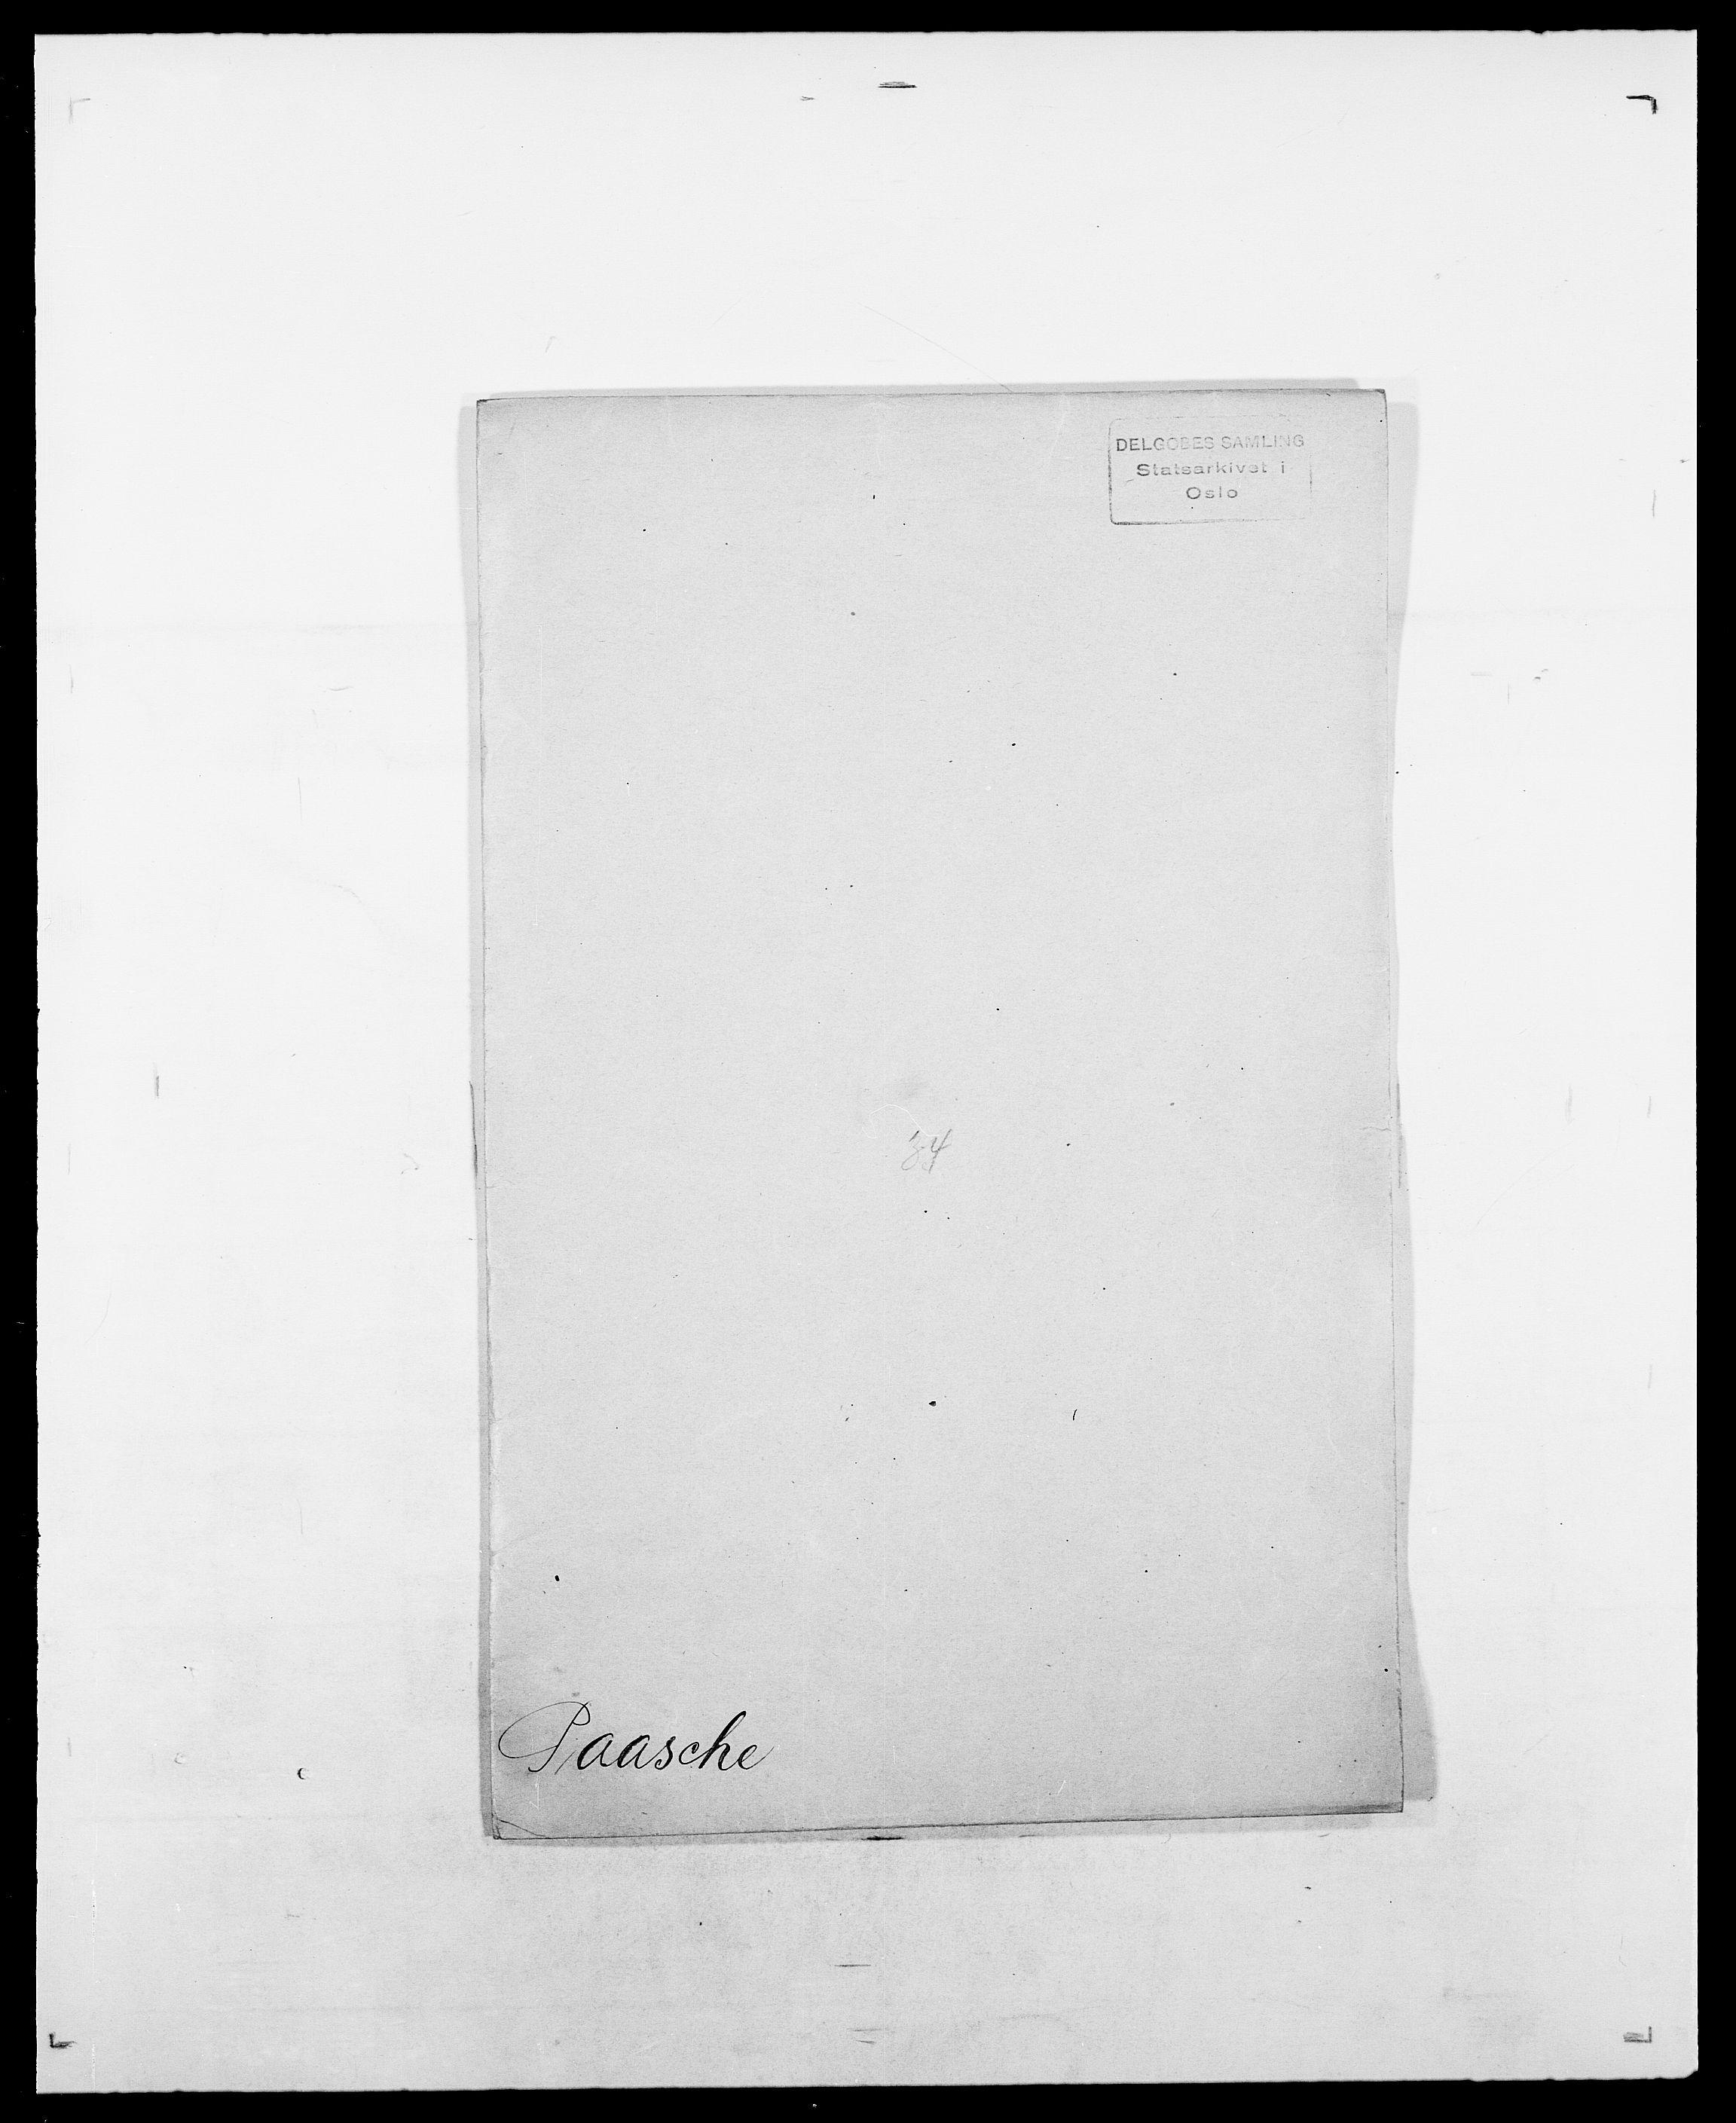 SAO, Delgobe, Charles Antoine - samling, D/Da/L0030: Paars - Pittelkov, s. 6